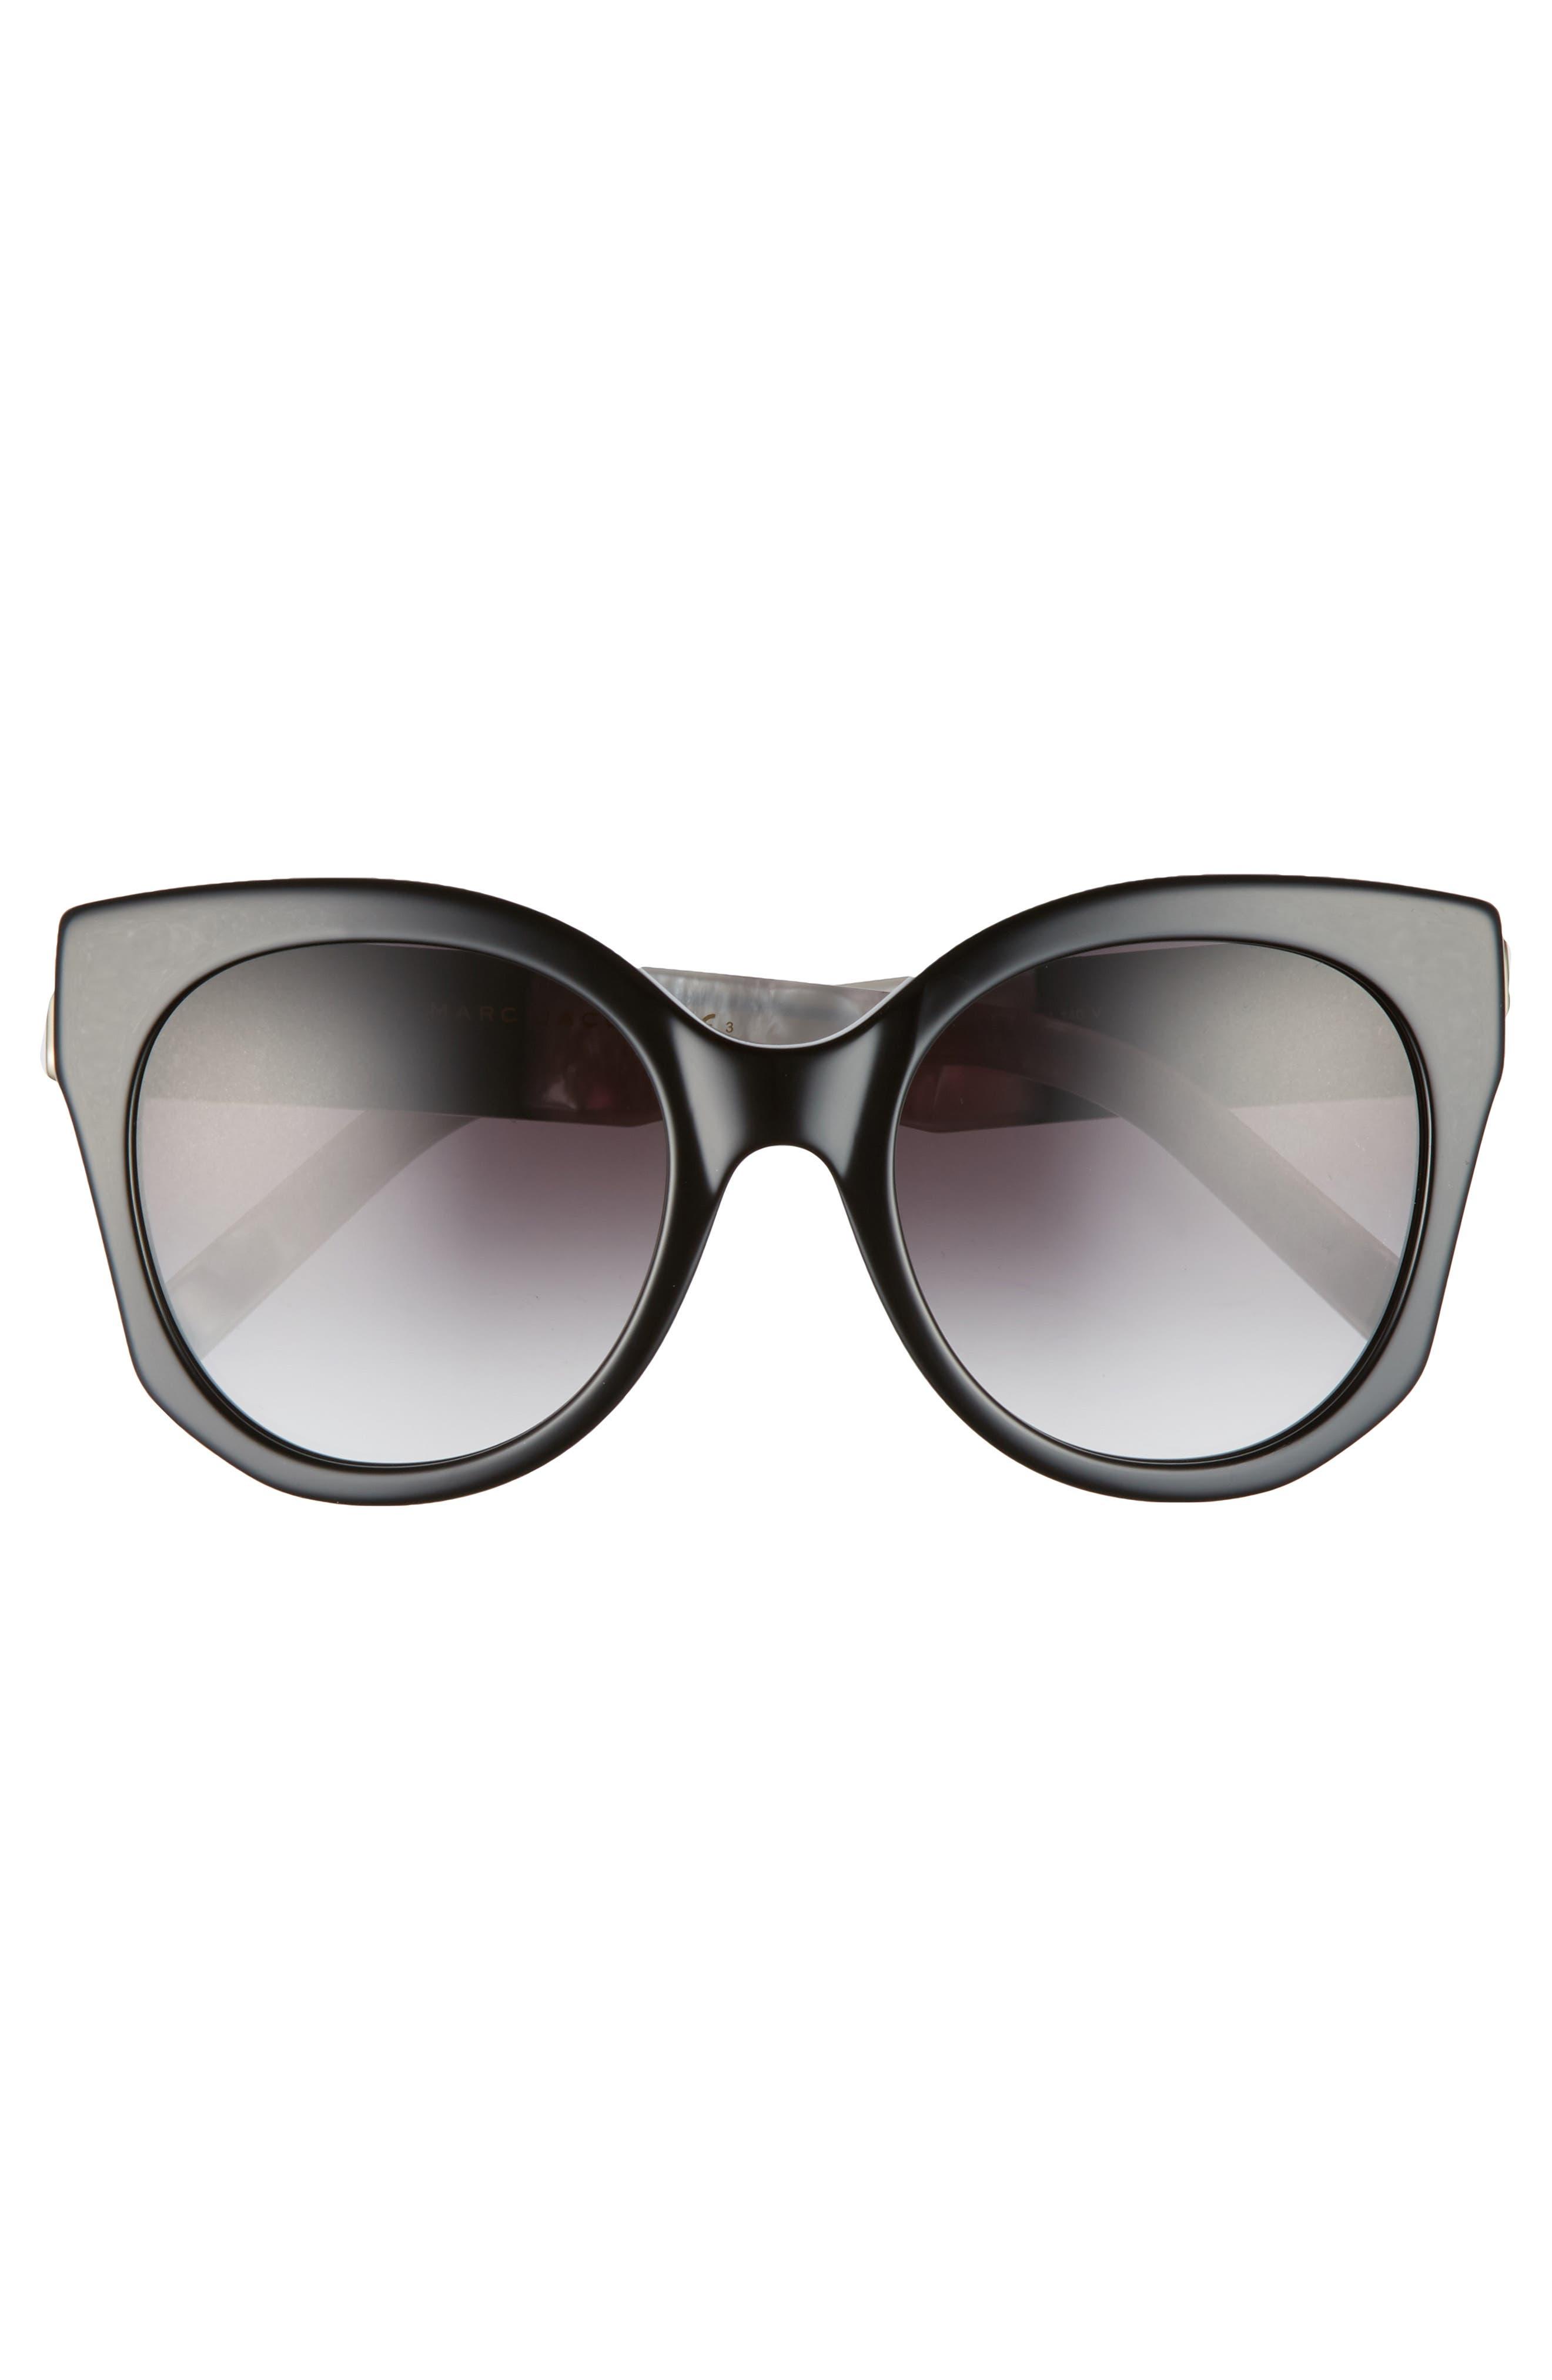 53mm Gradient Lens Cat Eye Sunglasses,                             Alternate thumbnail 3, color,                             001